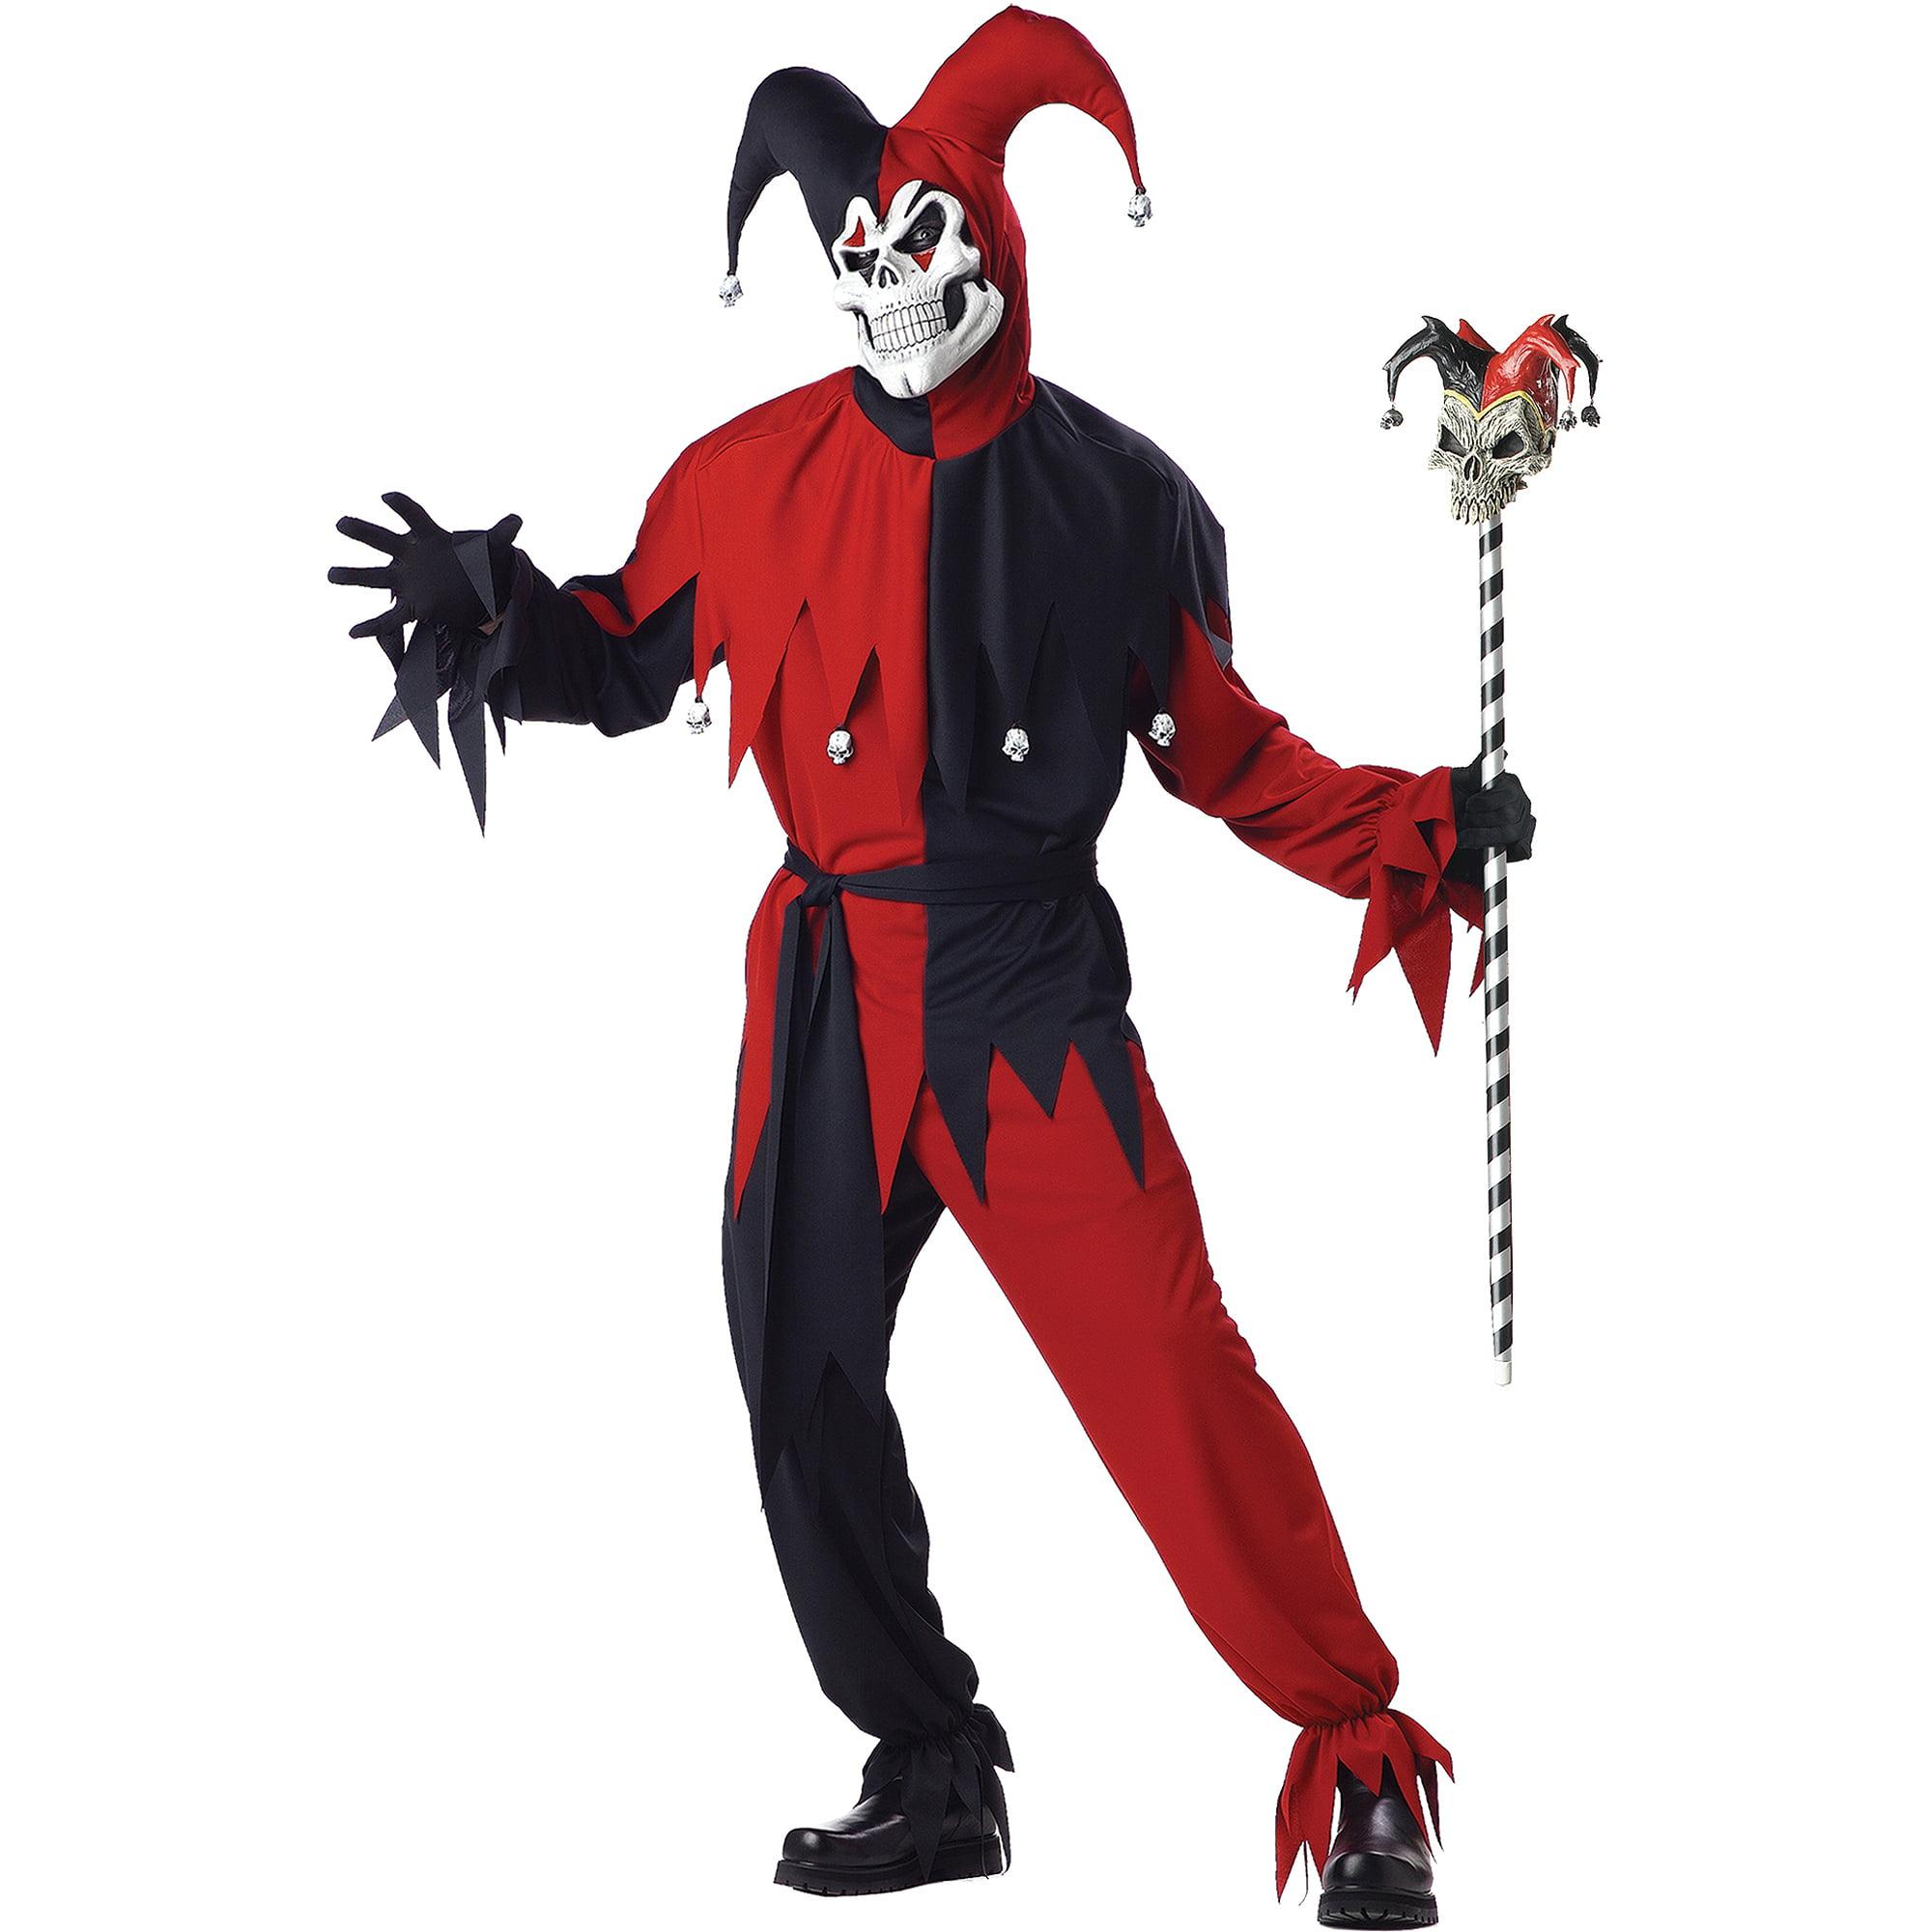 Halloween Costume 500.Jester Evil Adult Halloween Costume